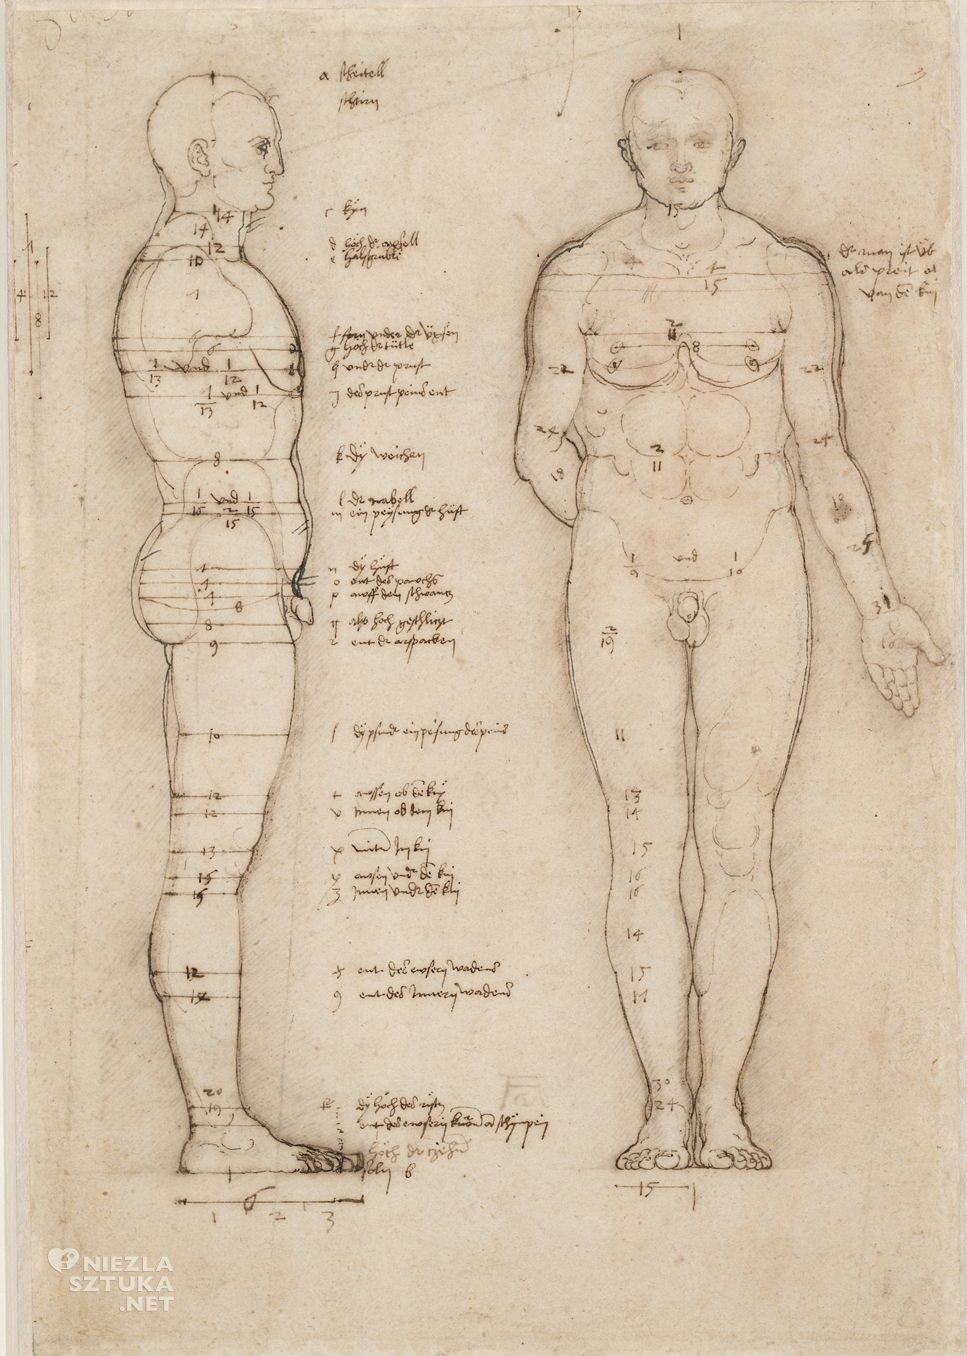 Albrecht Durer, Traktat o proporcjach ciała ludzkiego, Niezła sztuka